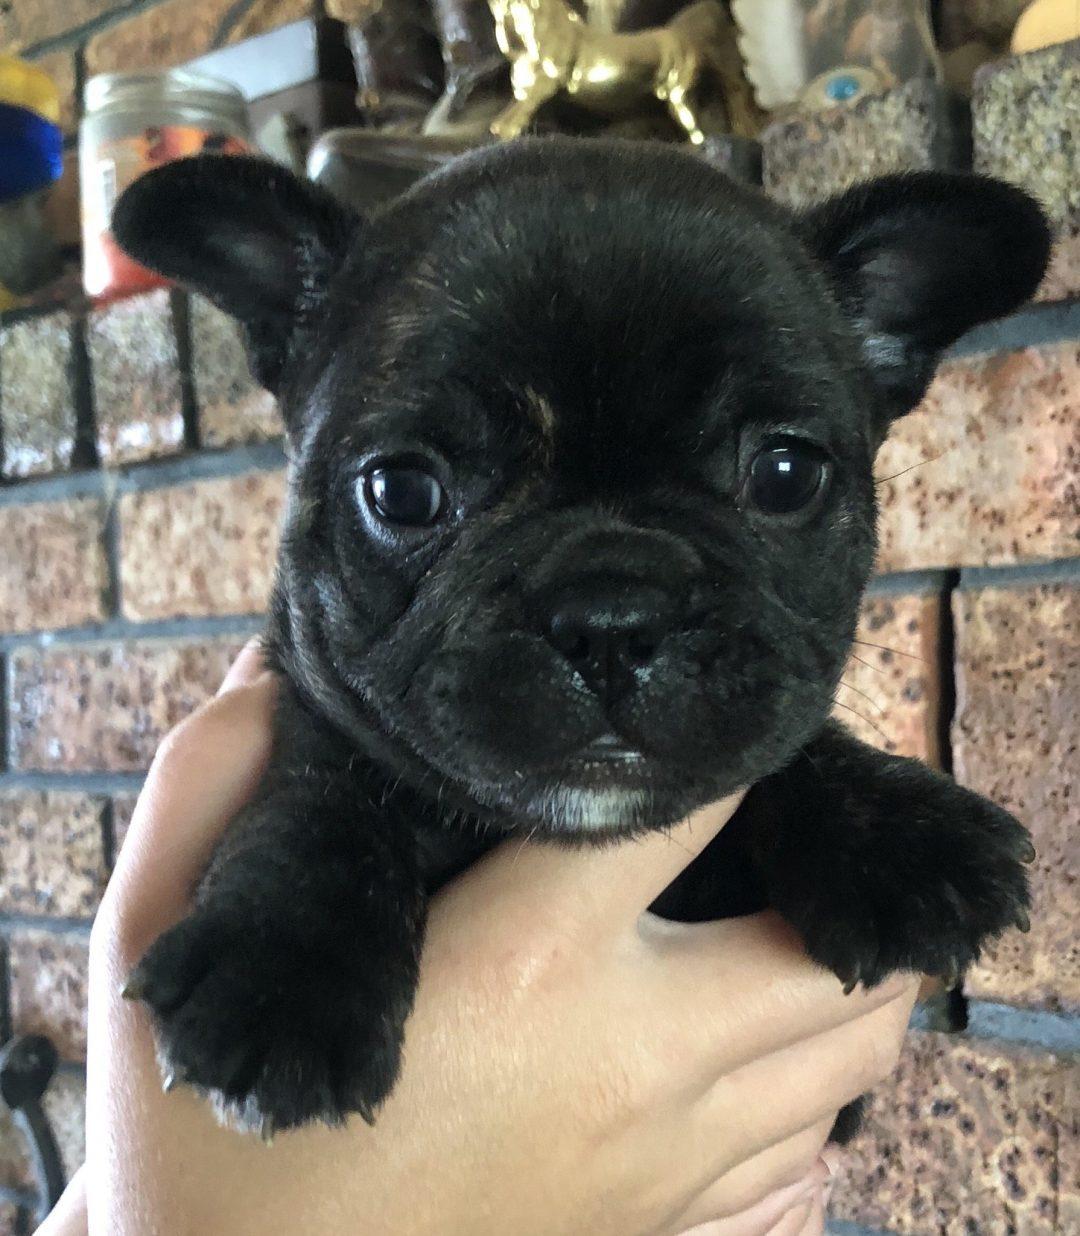 Benny - AKC French Bulldog pupper for sale near Cushing, Oklahoma